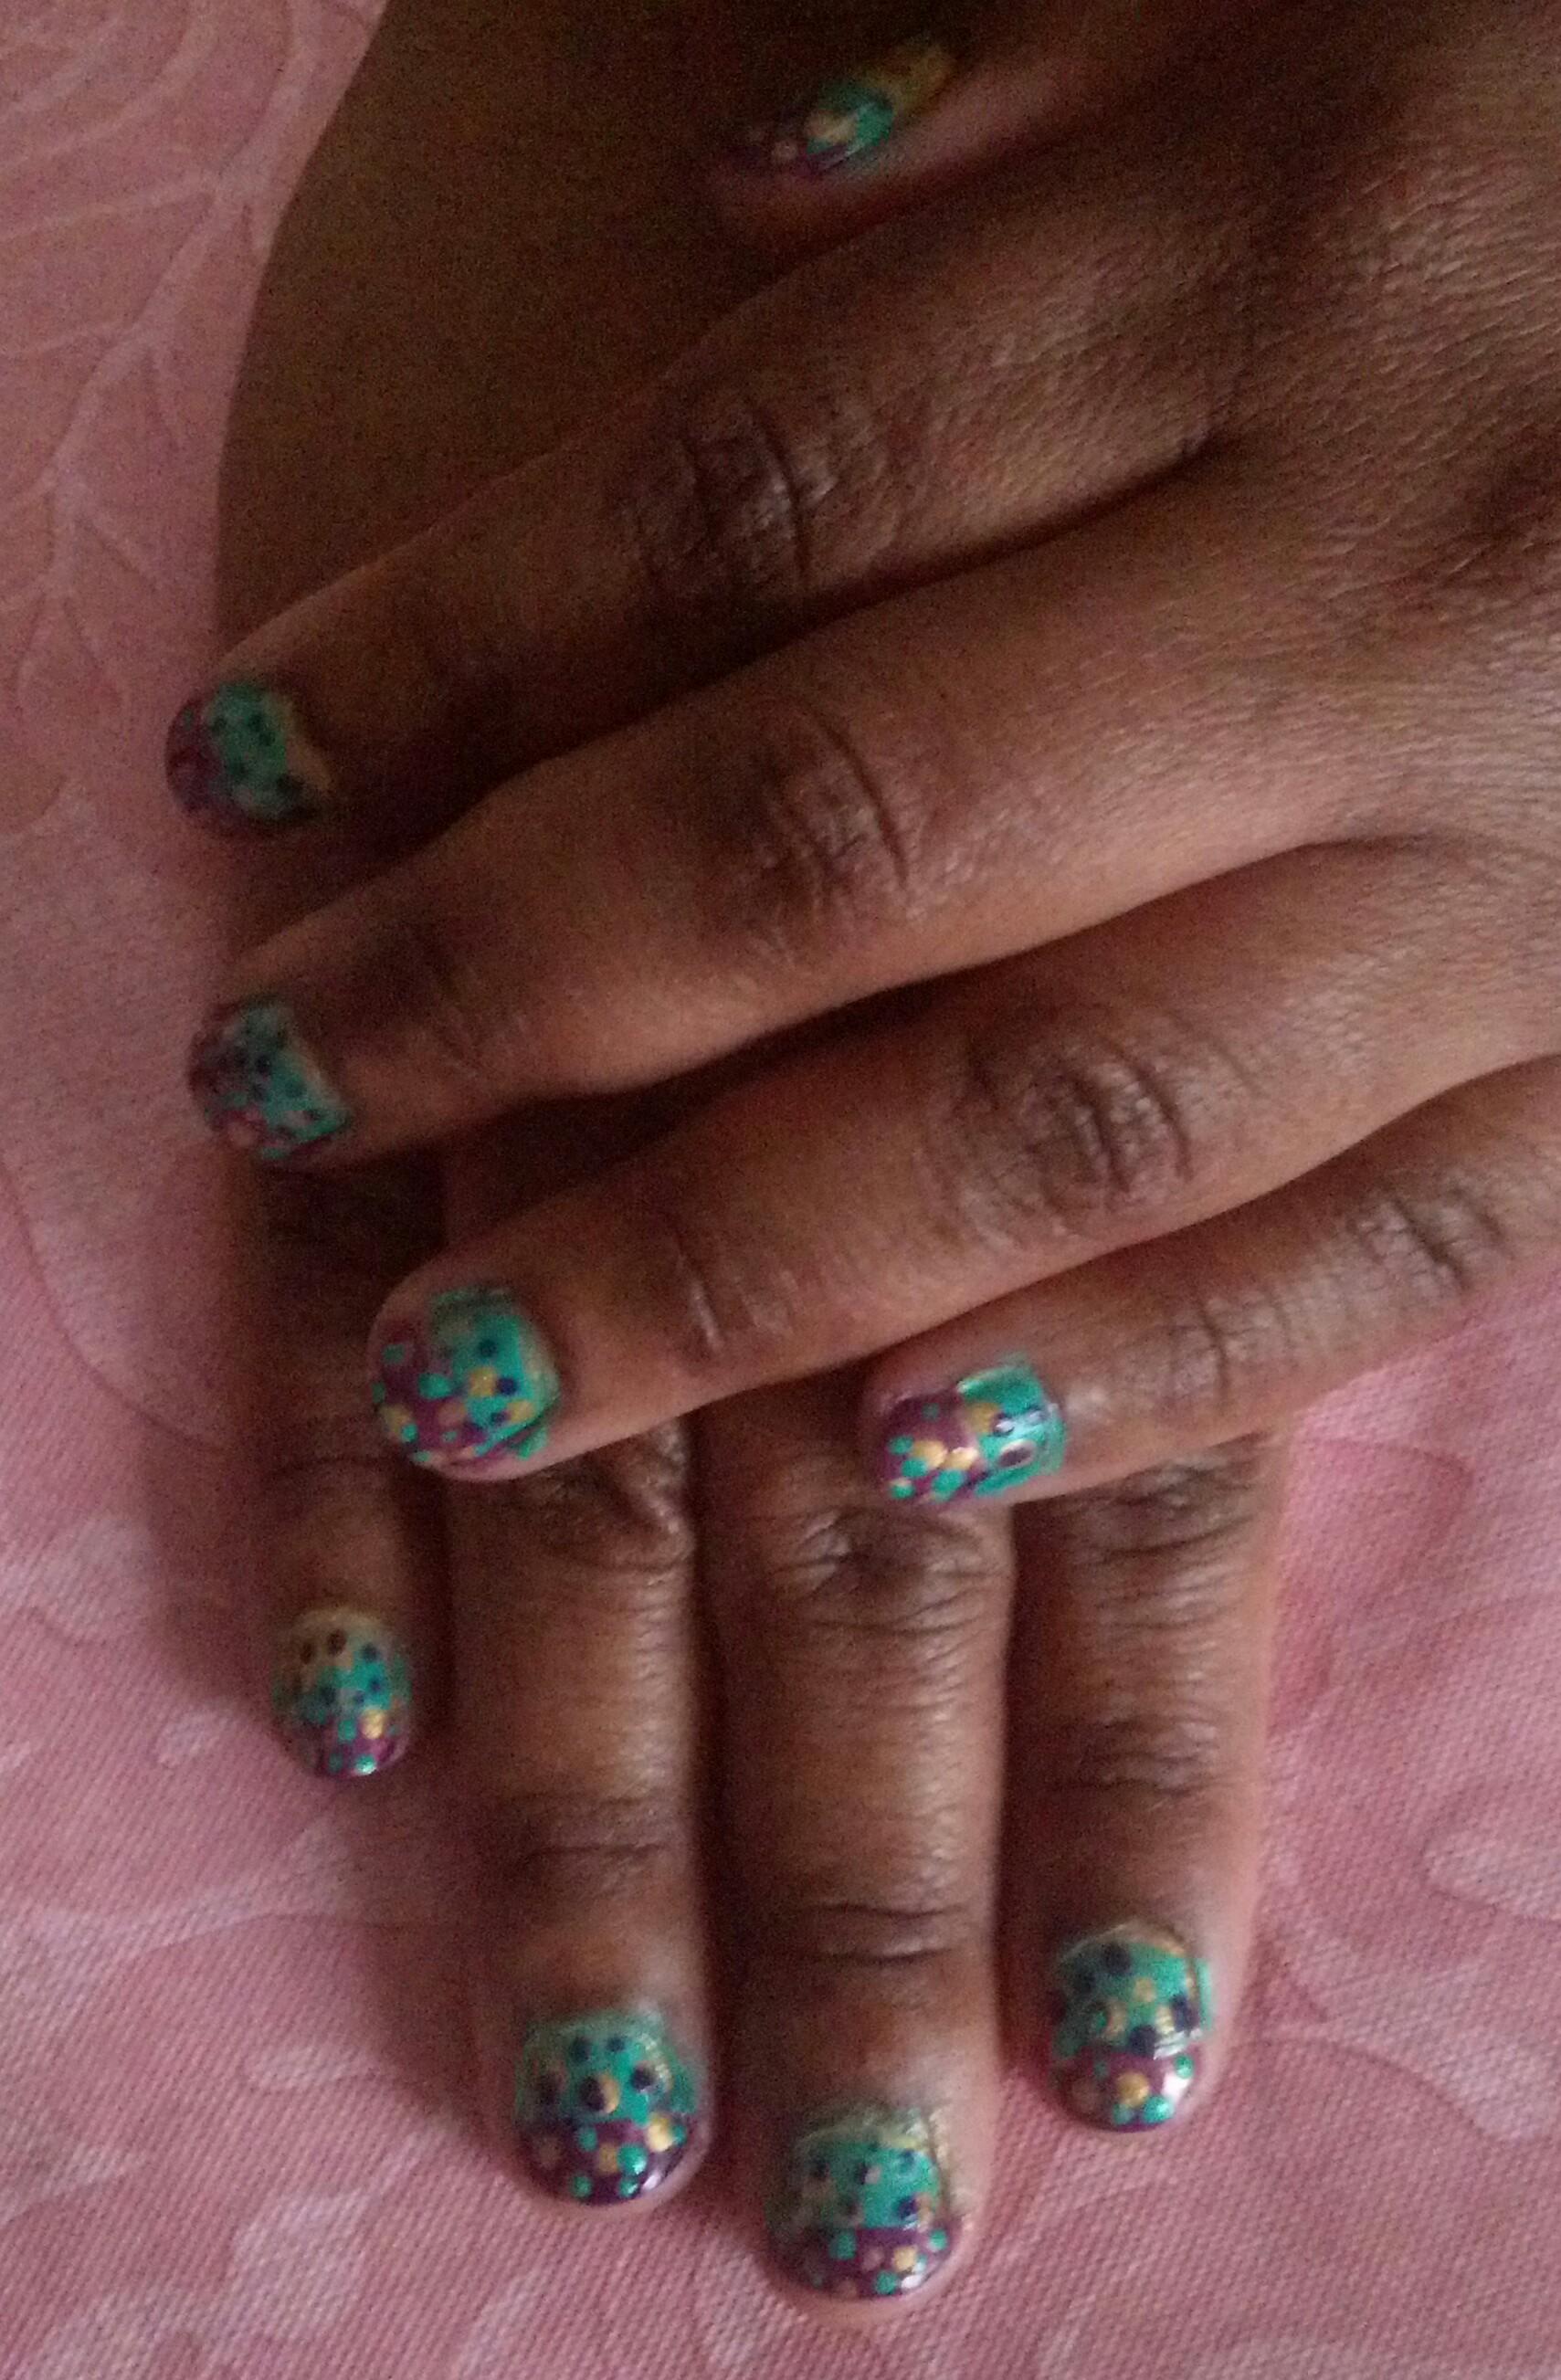 Mardi Gras Nail Design: Featuring China Glaze | Beauty412